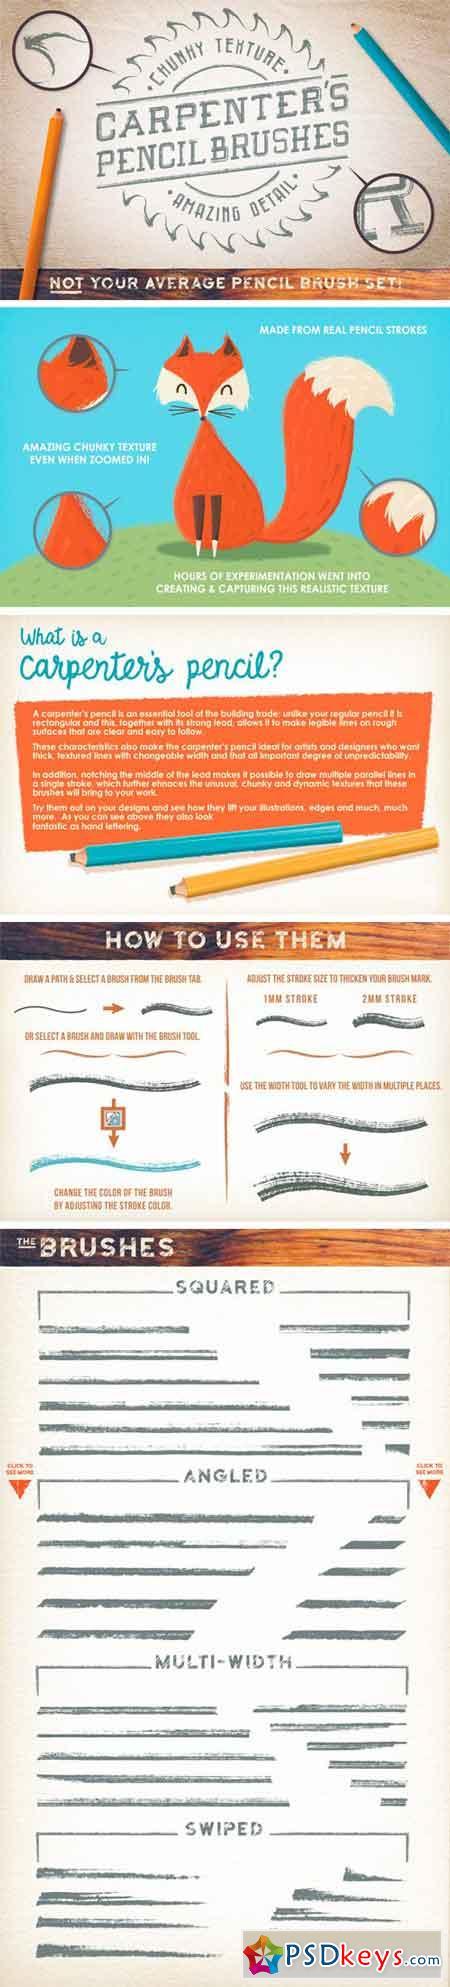 Carpenter's Pencil Brushes 382869 » Free Download Photoshop